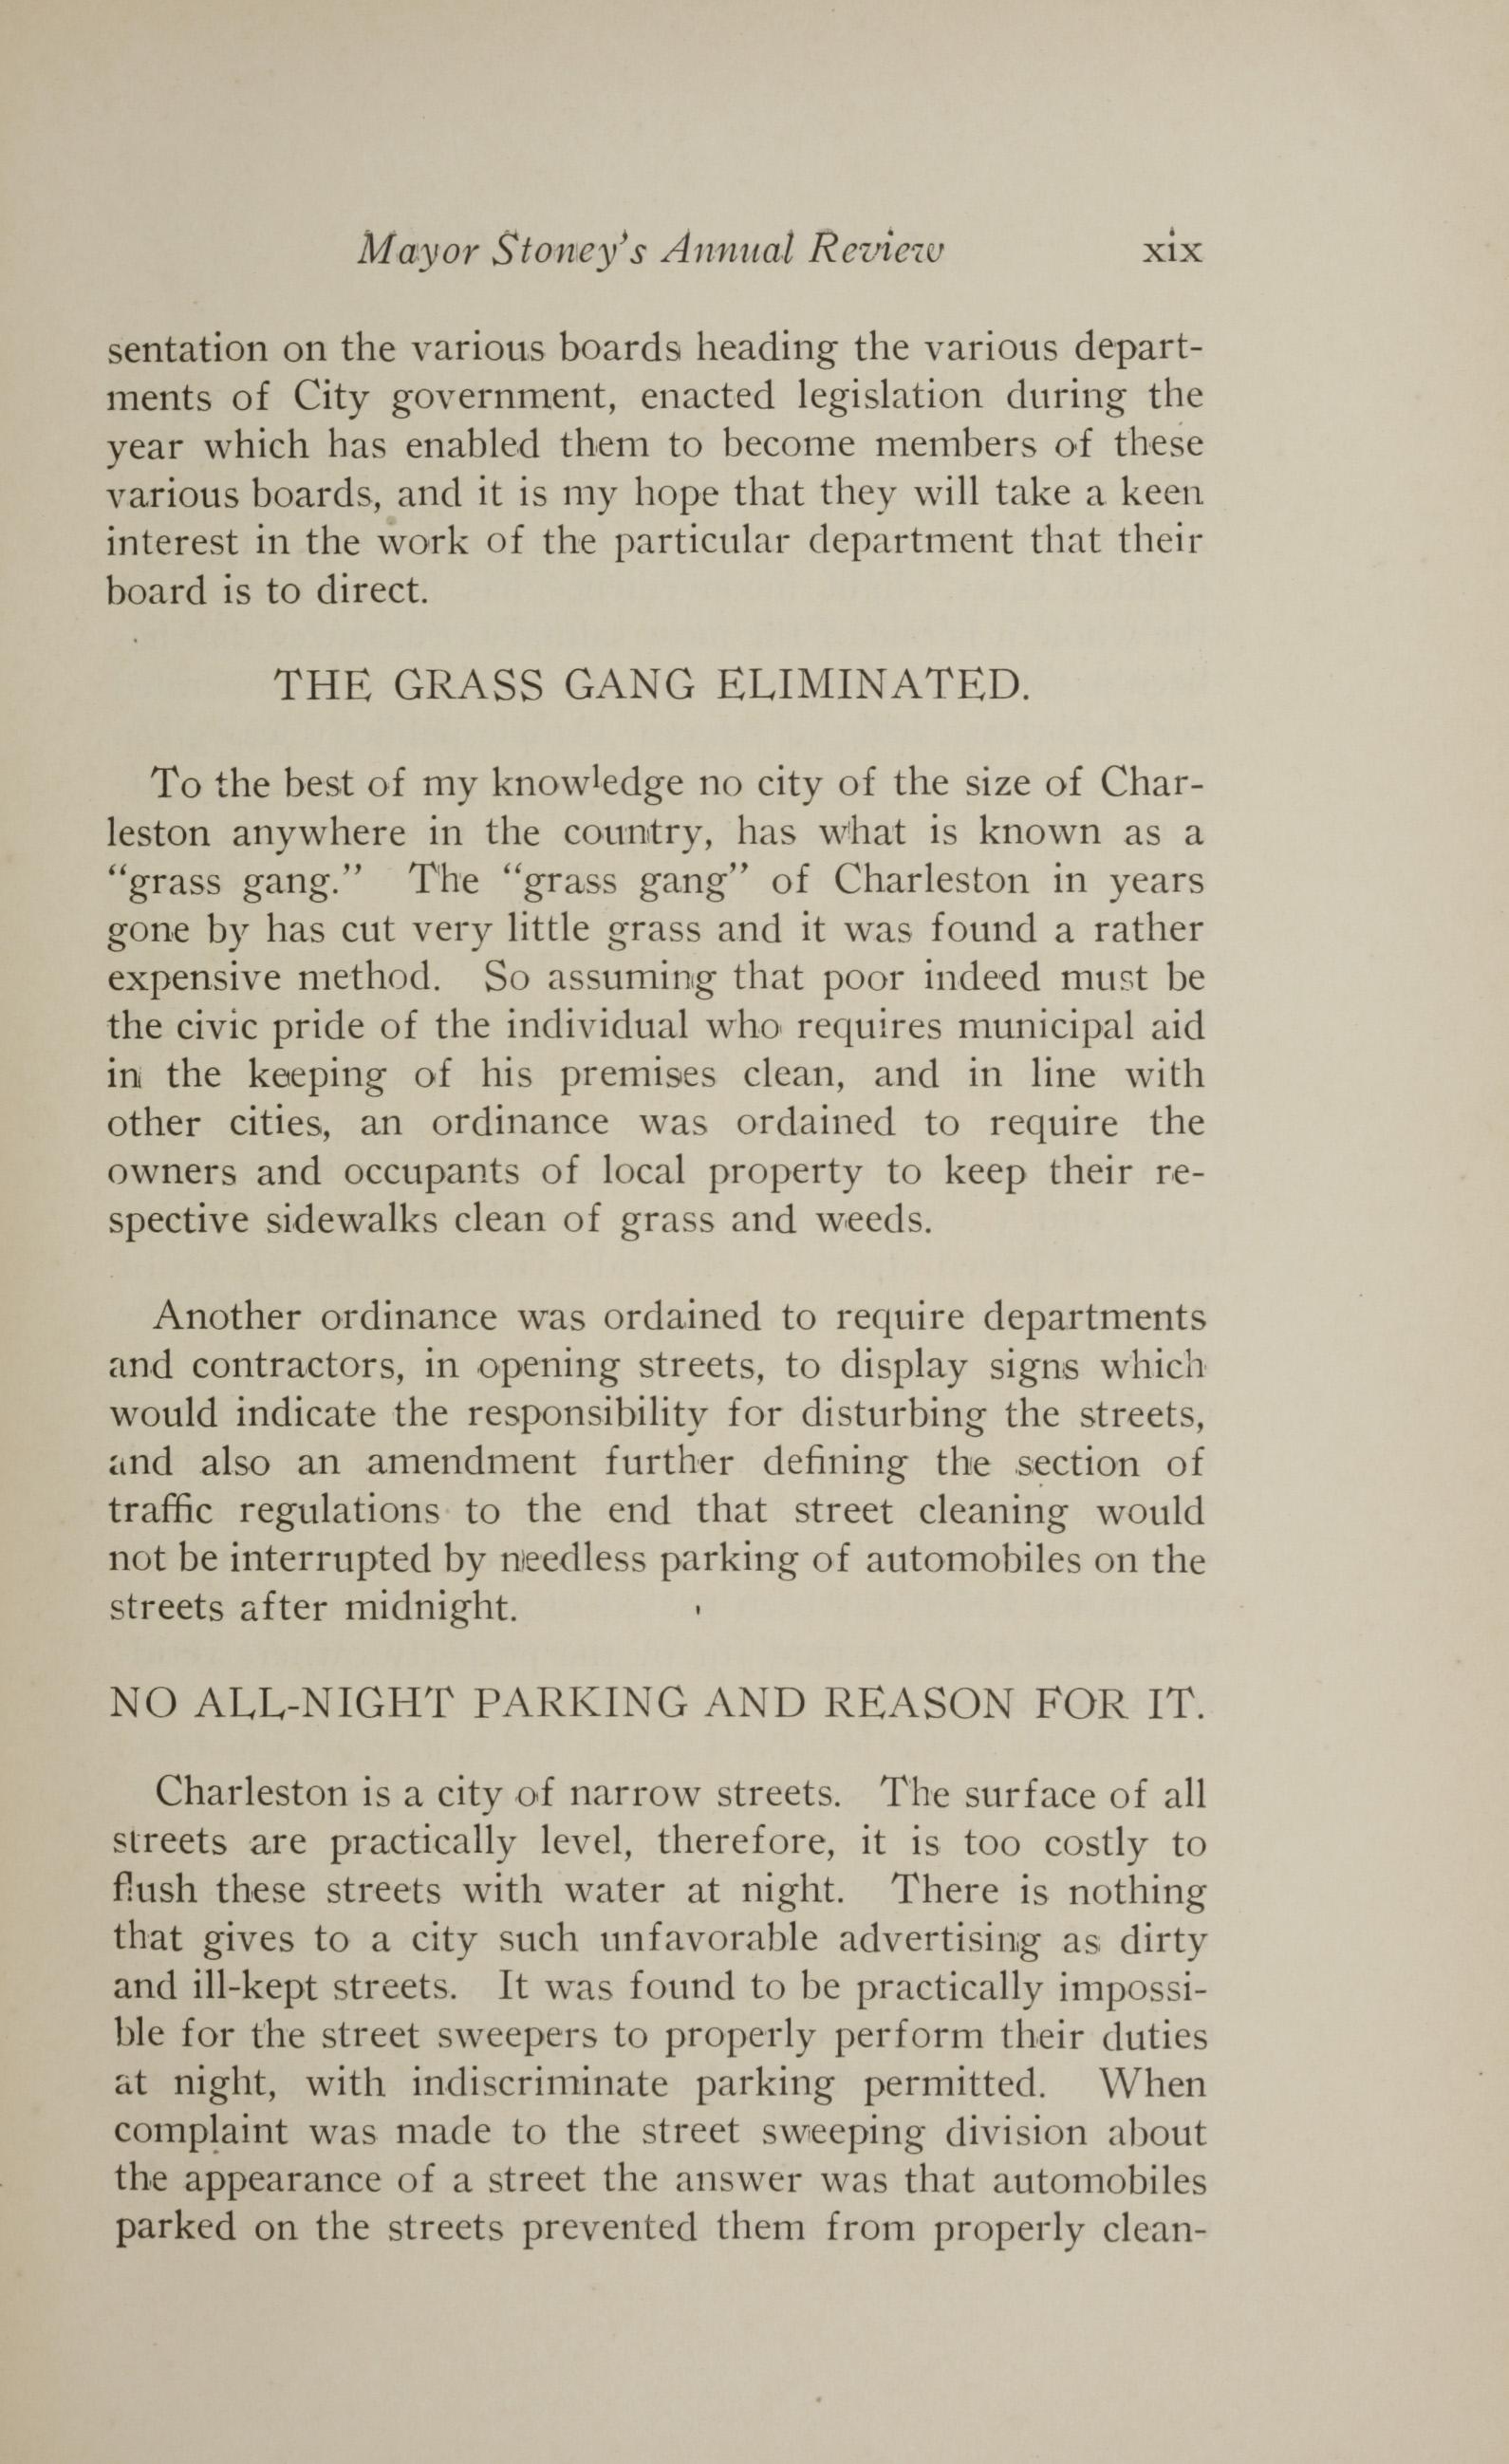 Charleston Yearbook, 1928, page xix